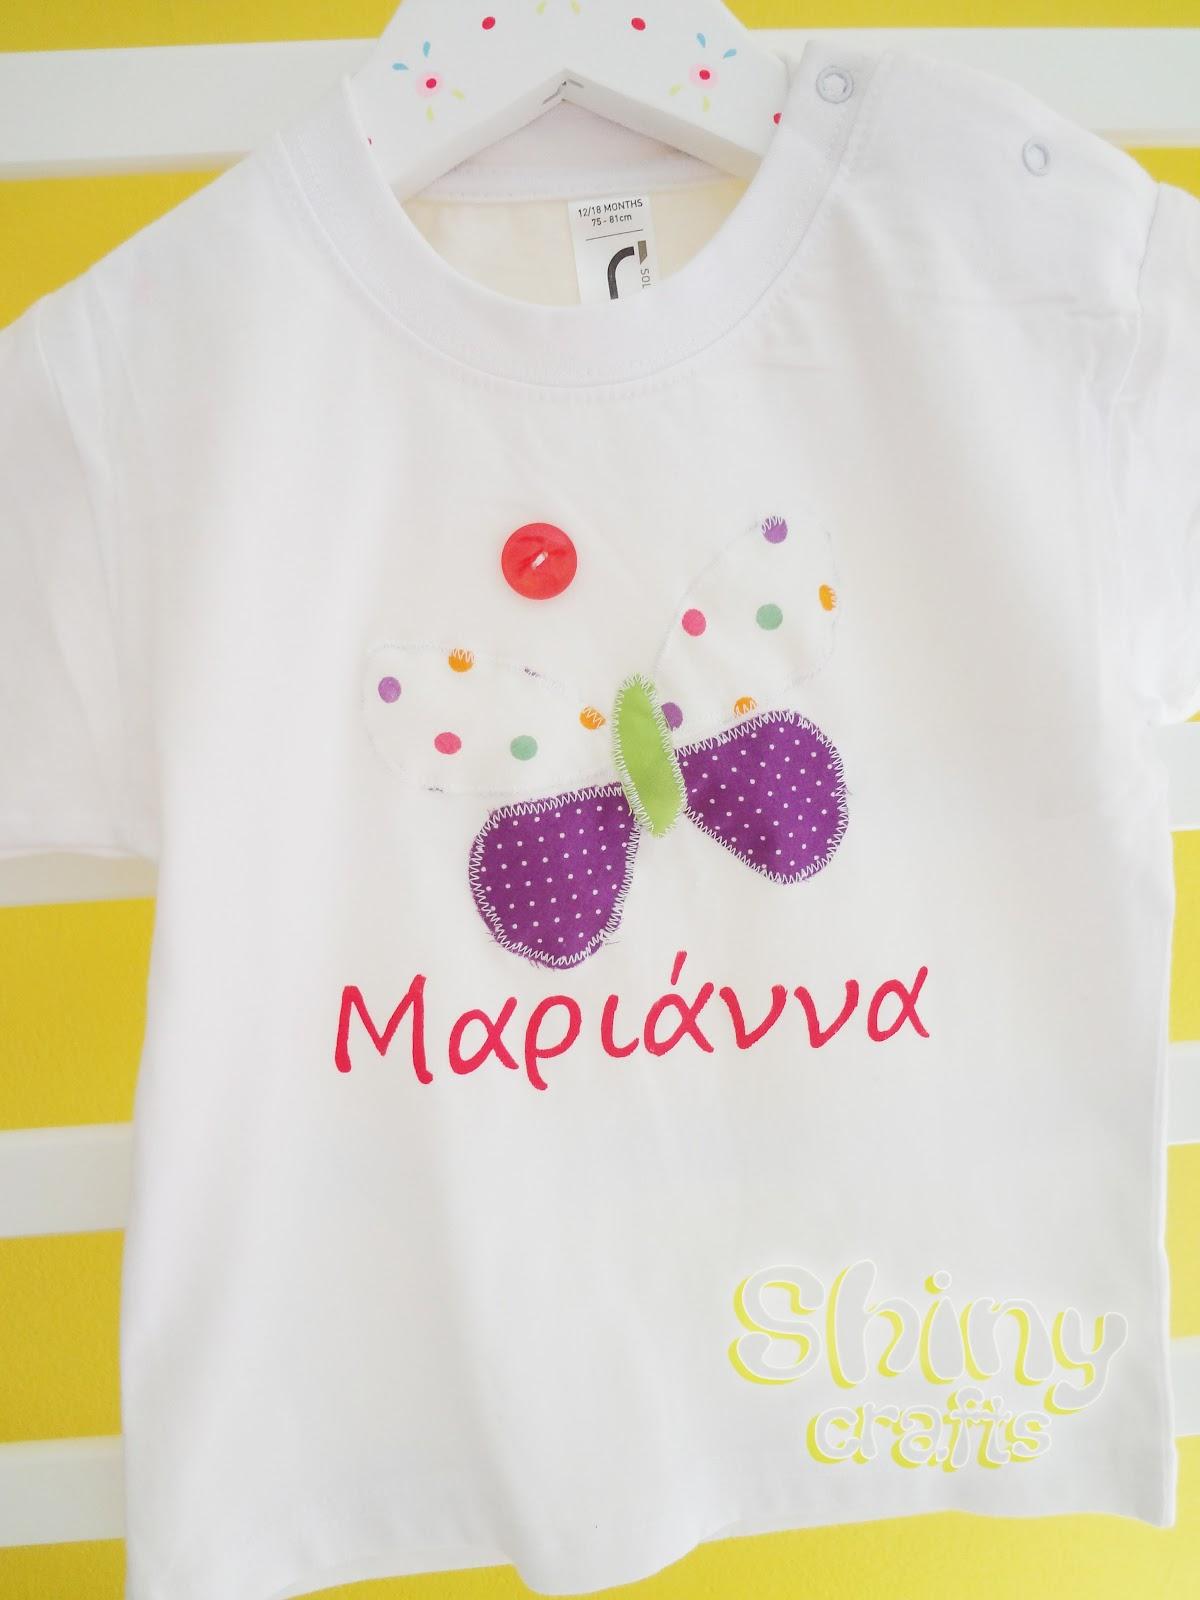 caaca5b66044 Παιδικό μπλουζάκι ζωγραφισμένο στο χέρι και απλικέ πεταλούδα για την  βάφτιση της μικρής Μαριάννας!